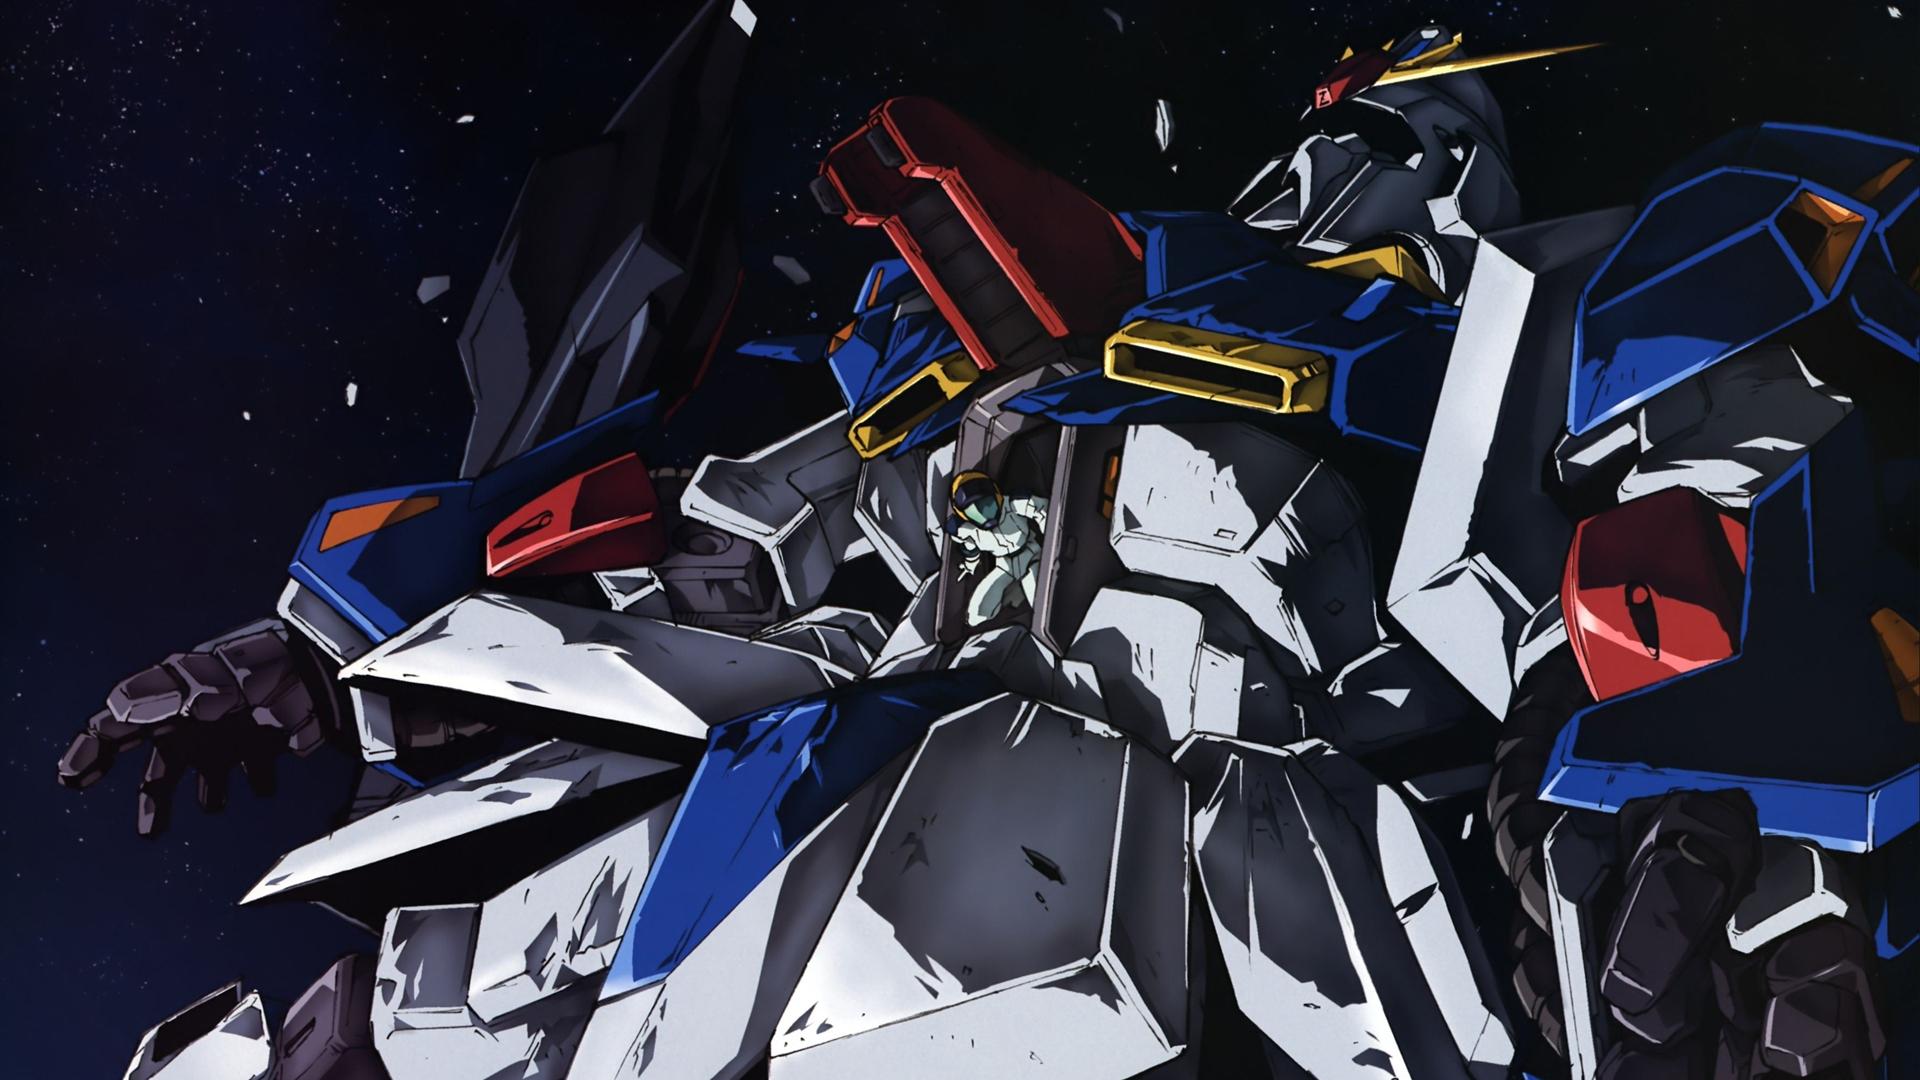 76 Gundam Wallpapers On Wallpapersafari